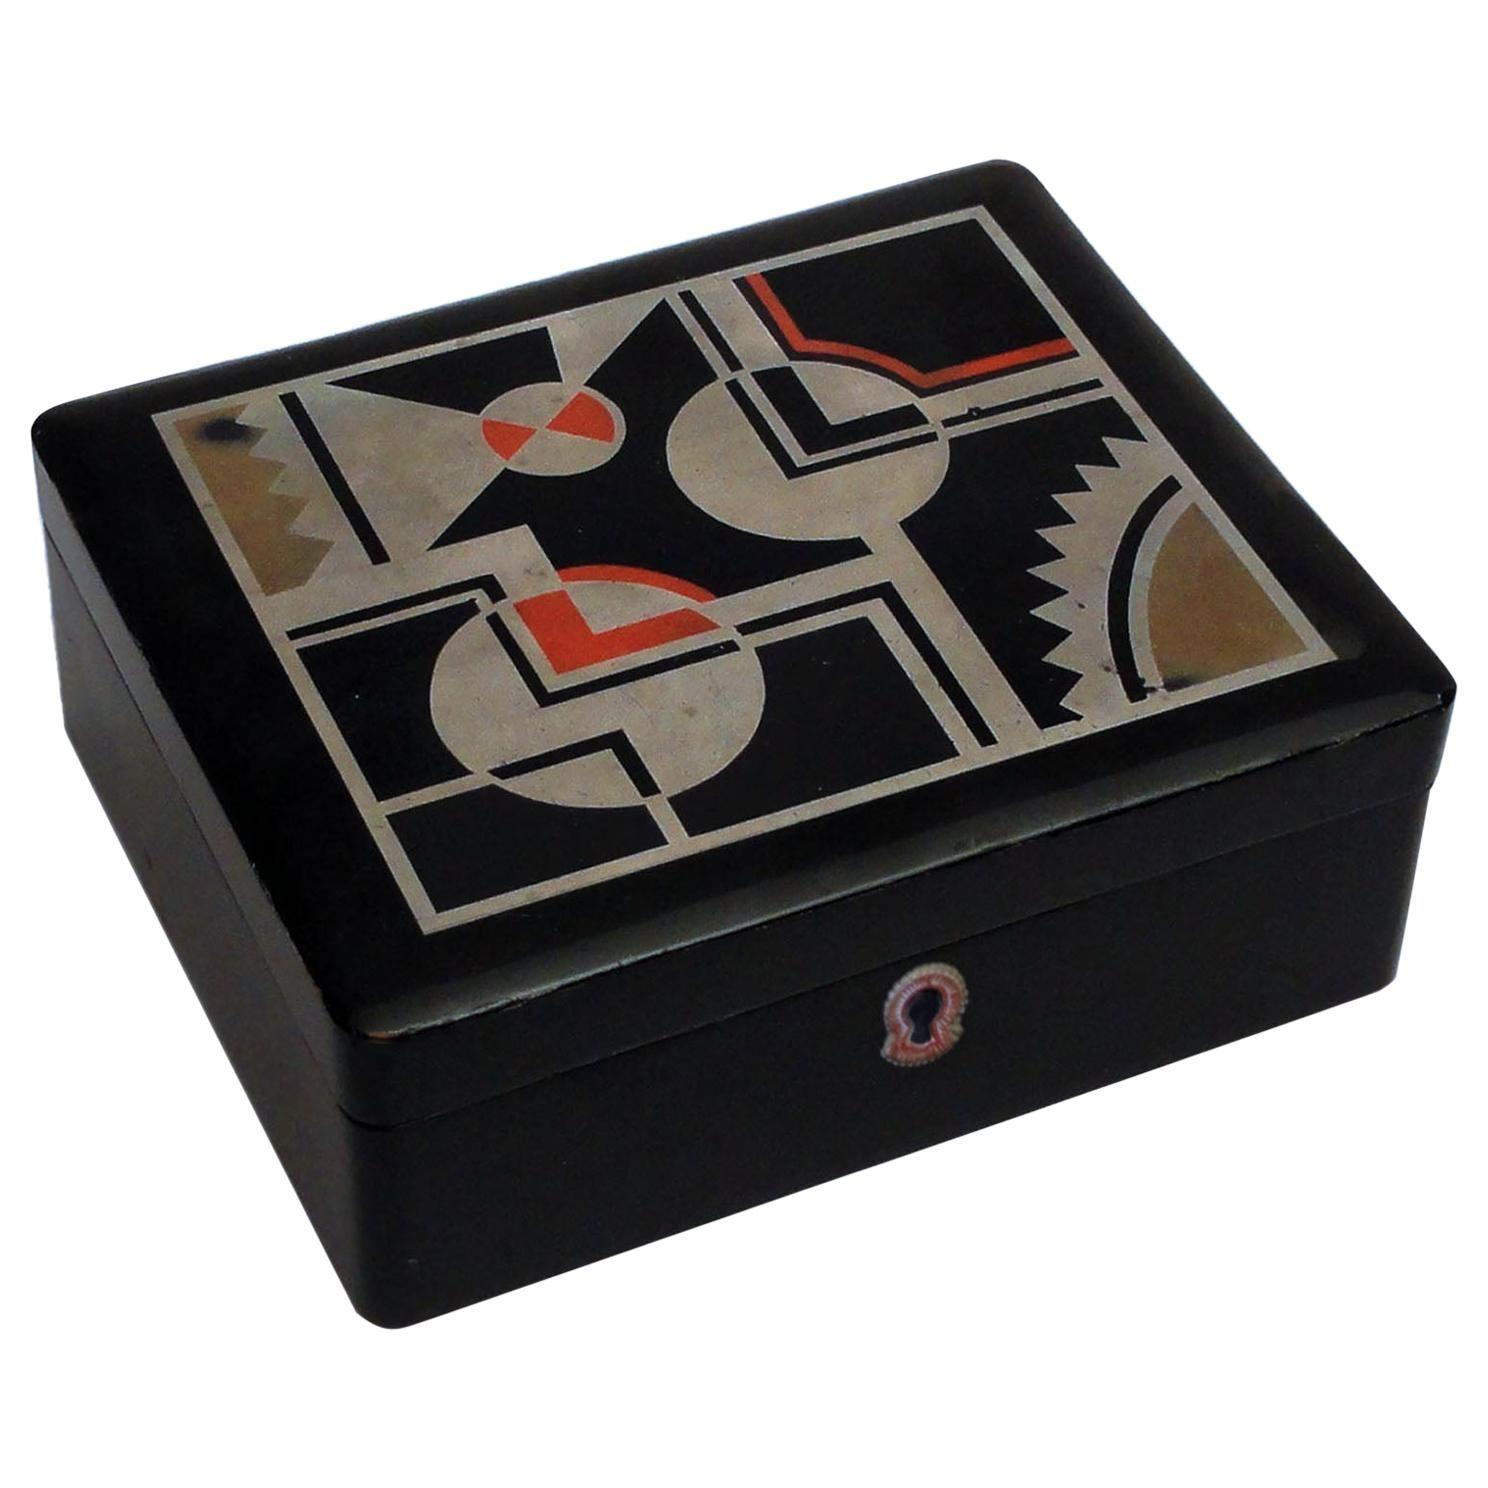 Art Deco French Lacquered Box, Jewelry Box, Geometric Decor